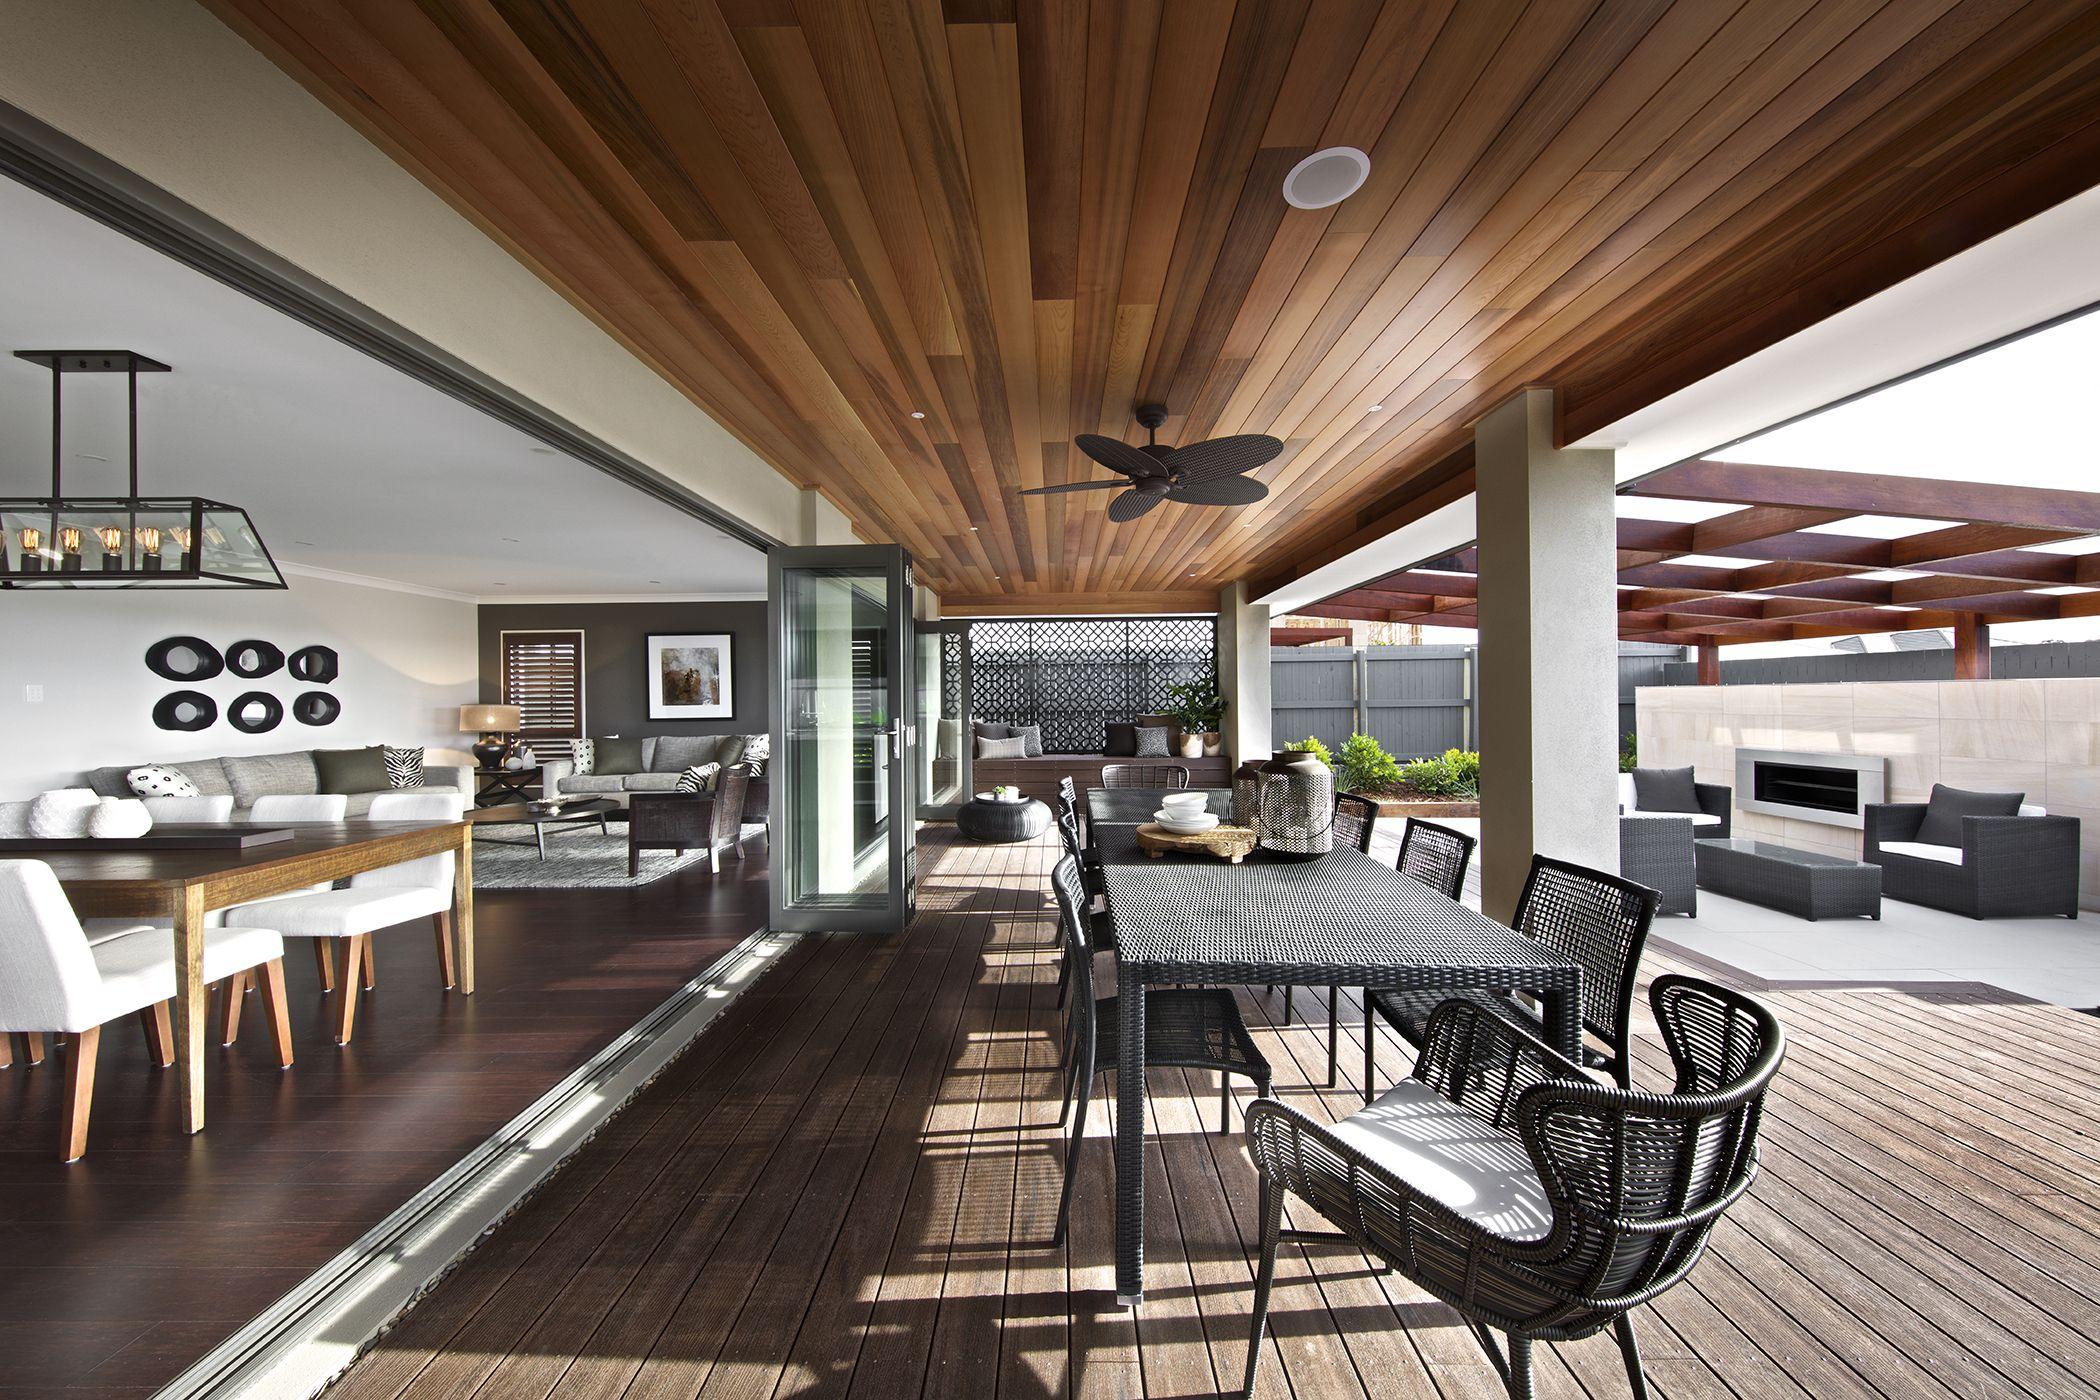 Madison 39 Home Design | Clarendon Homes